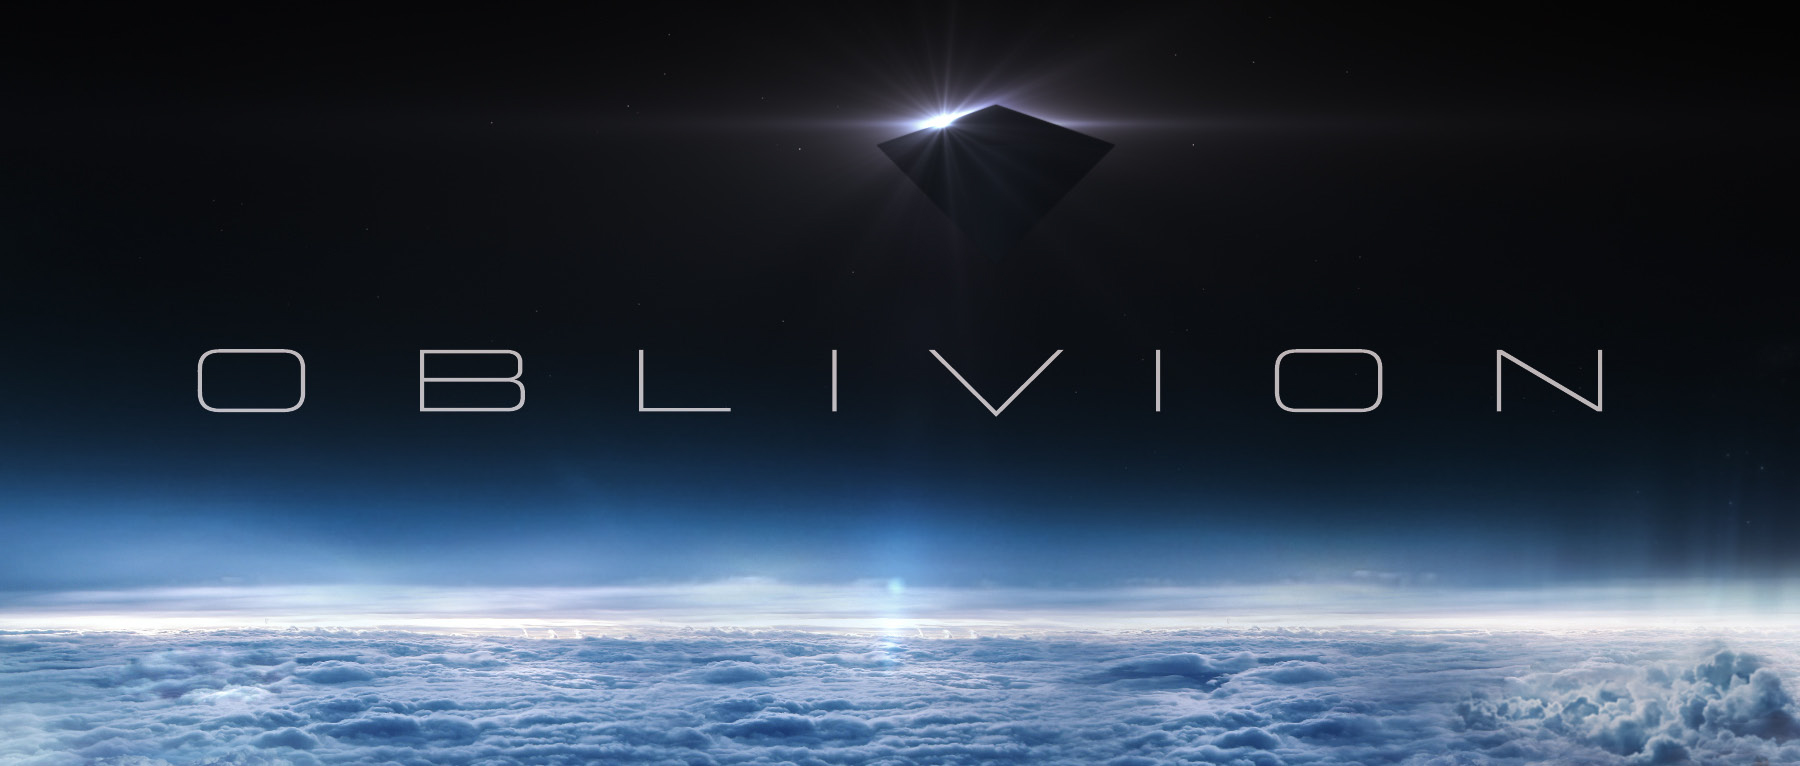 Oblivion_02_00004.jpg